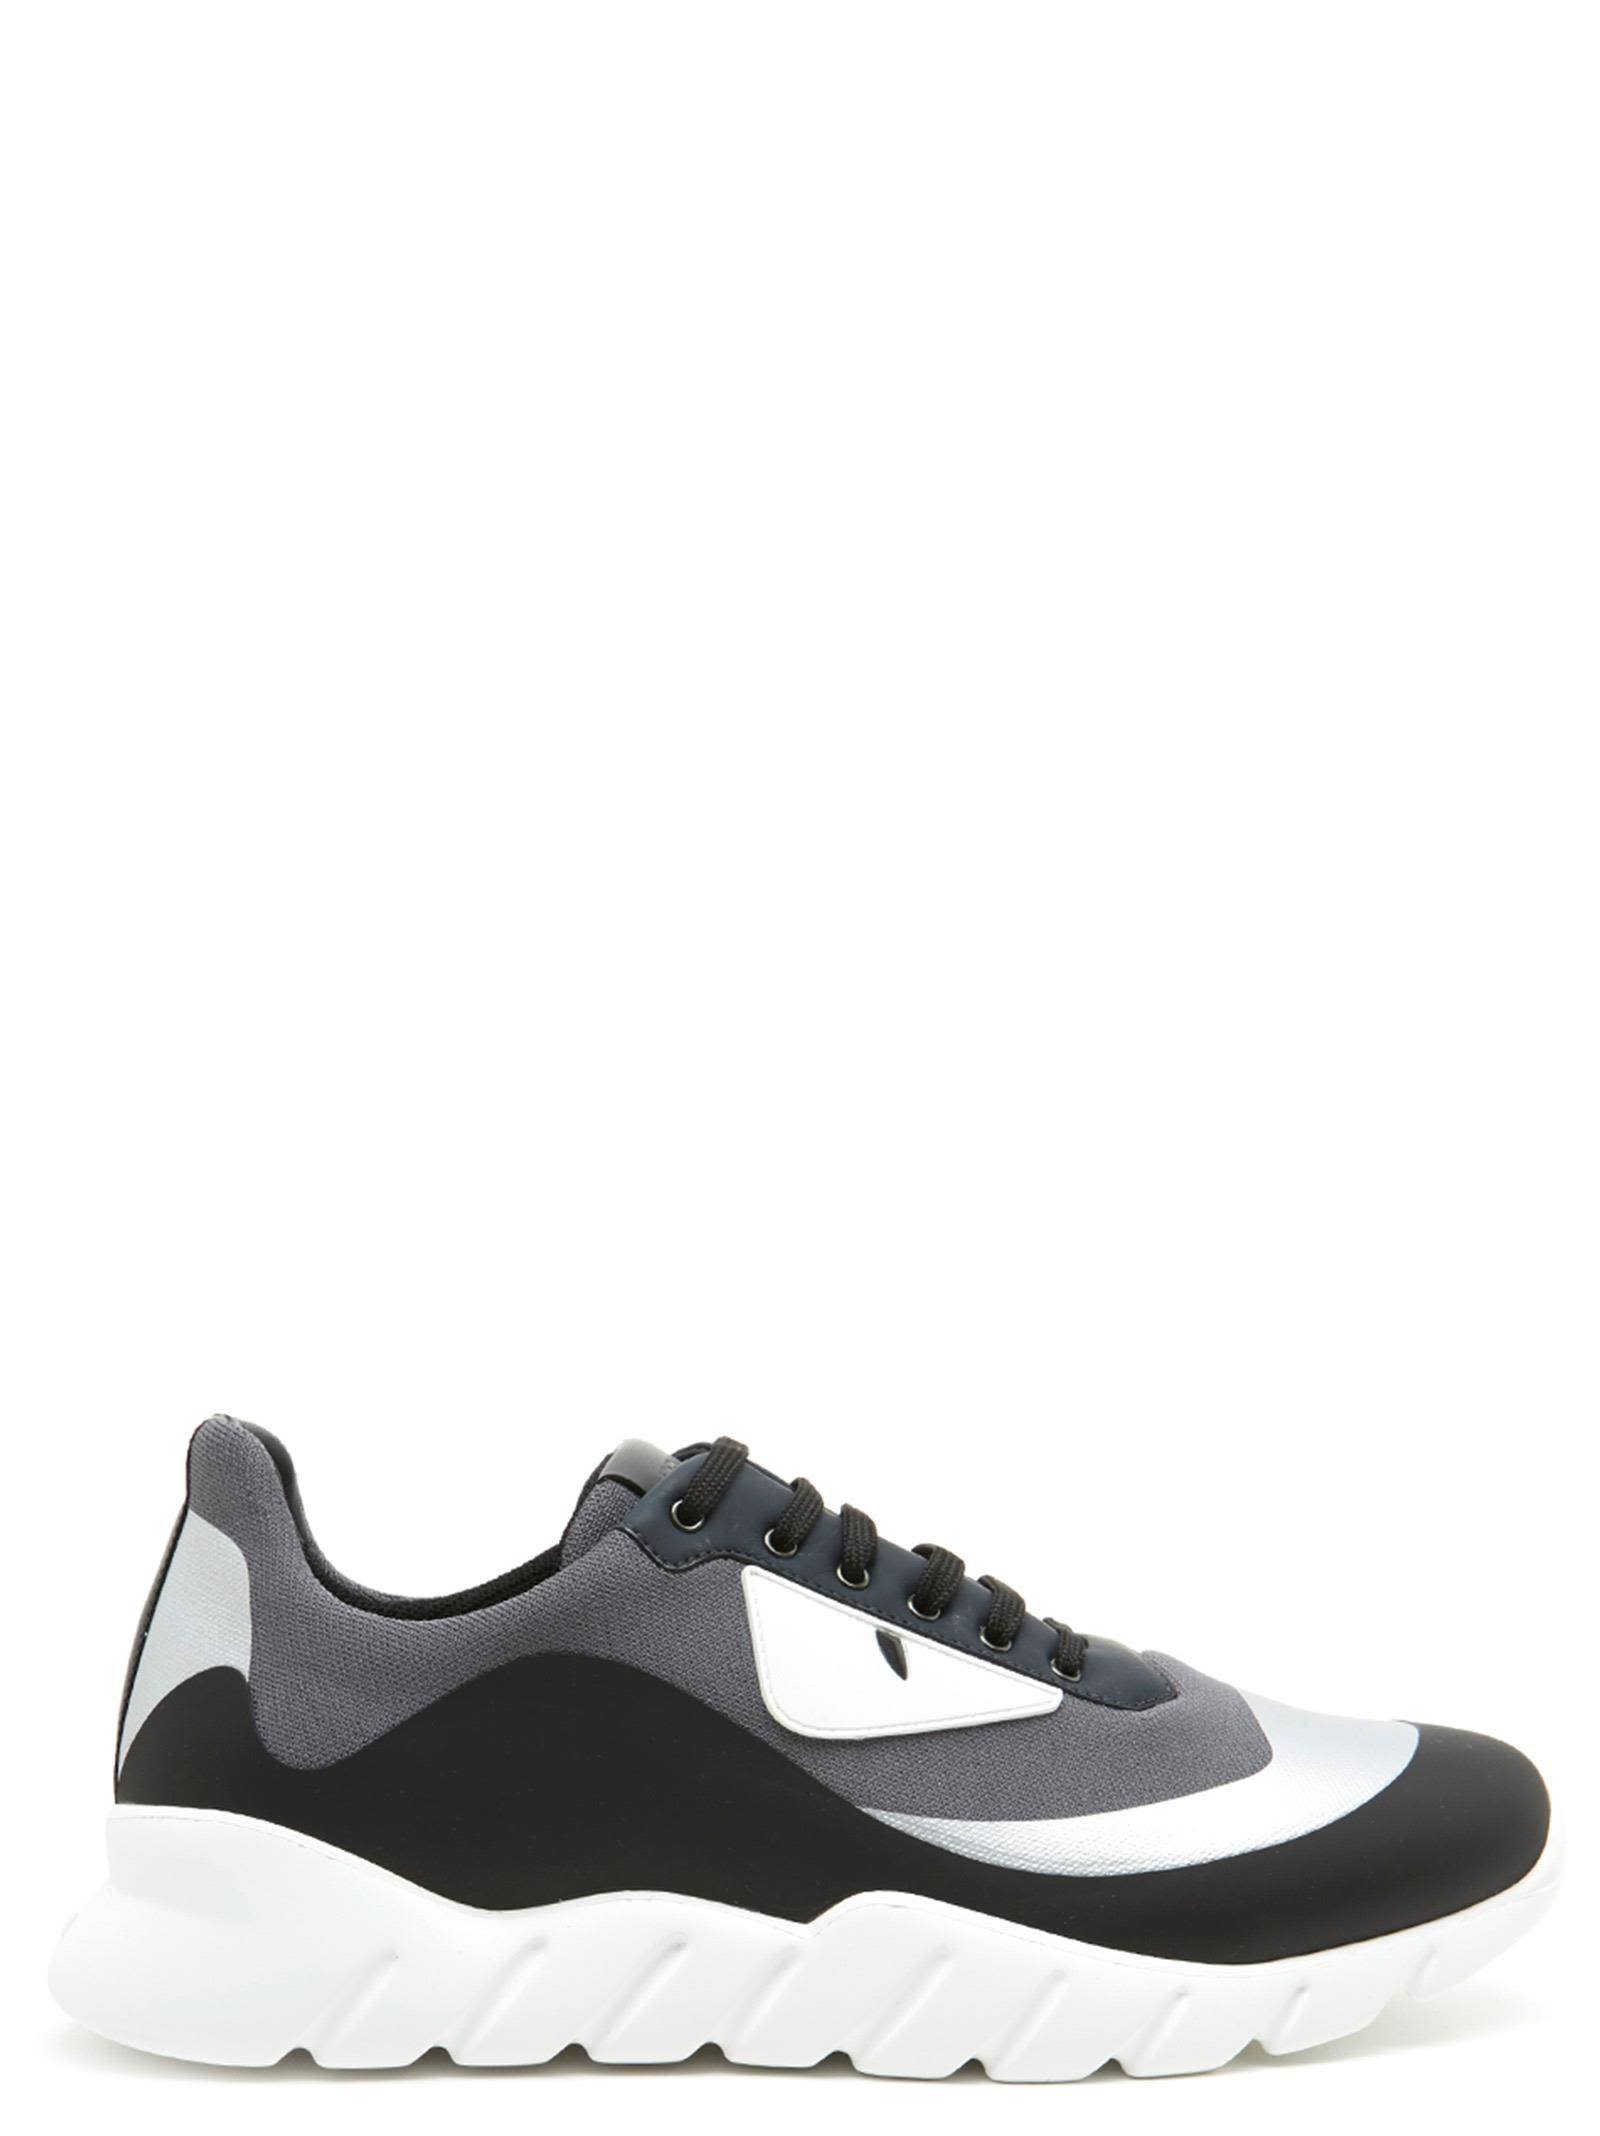 5a60891dd10f FENDI SNEAKERS.  fendi  shoes